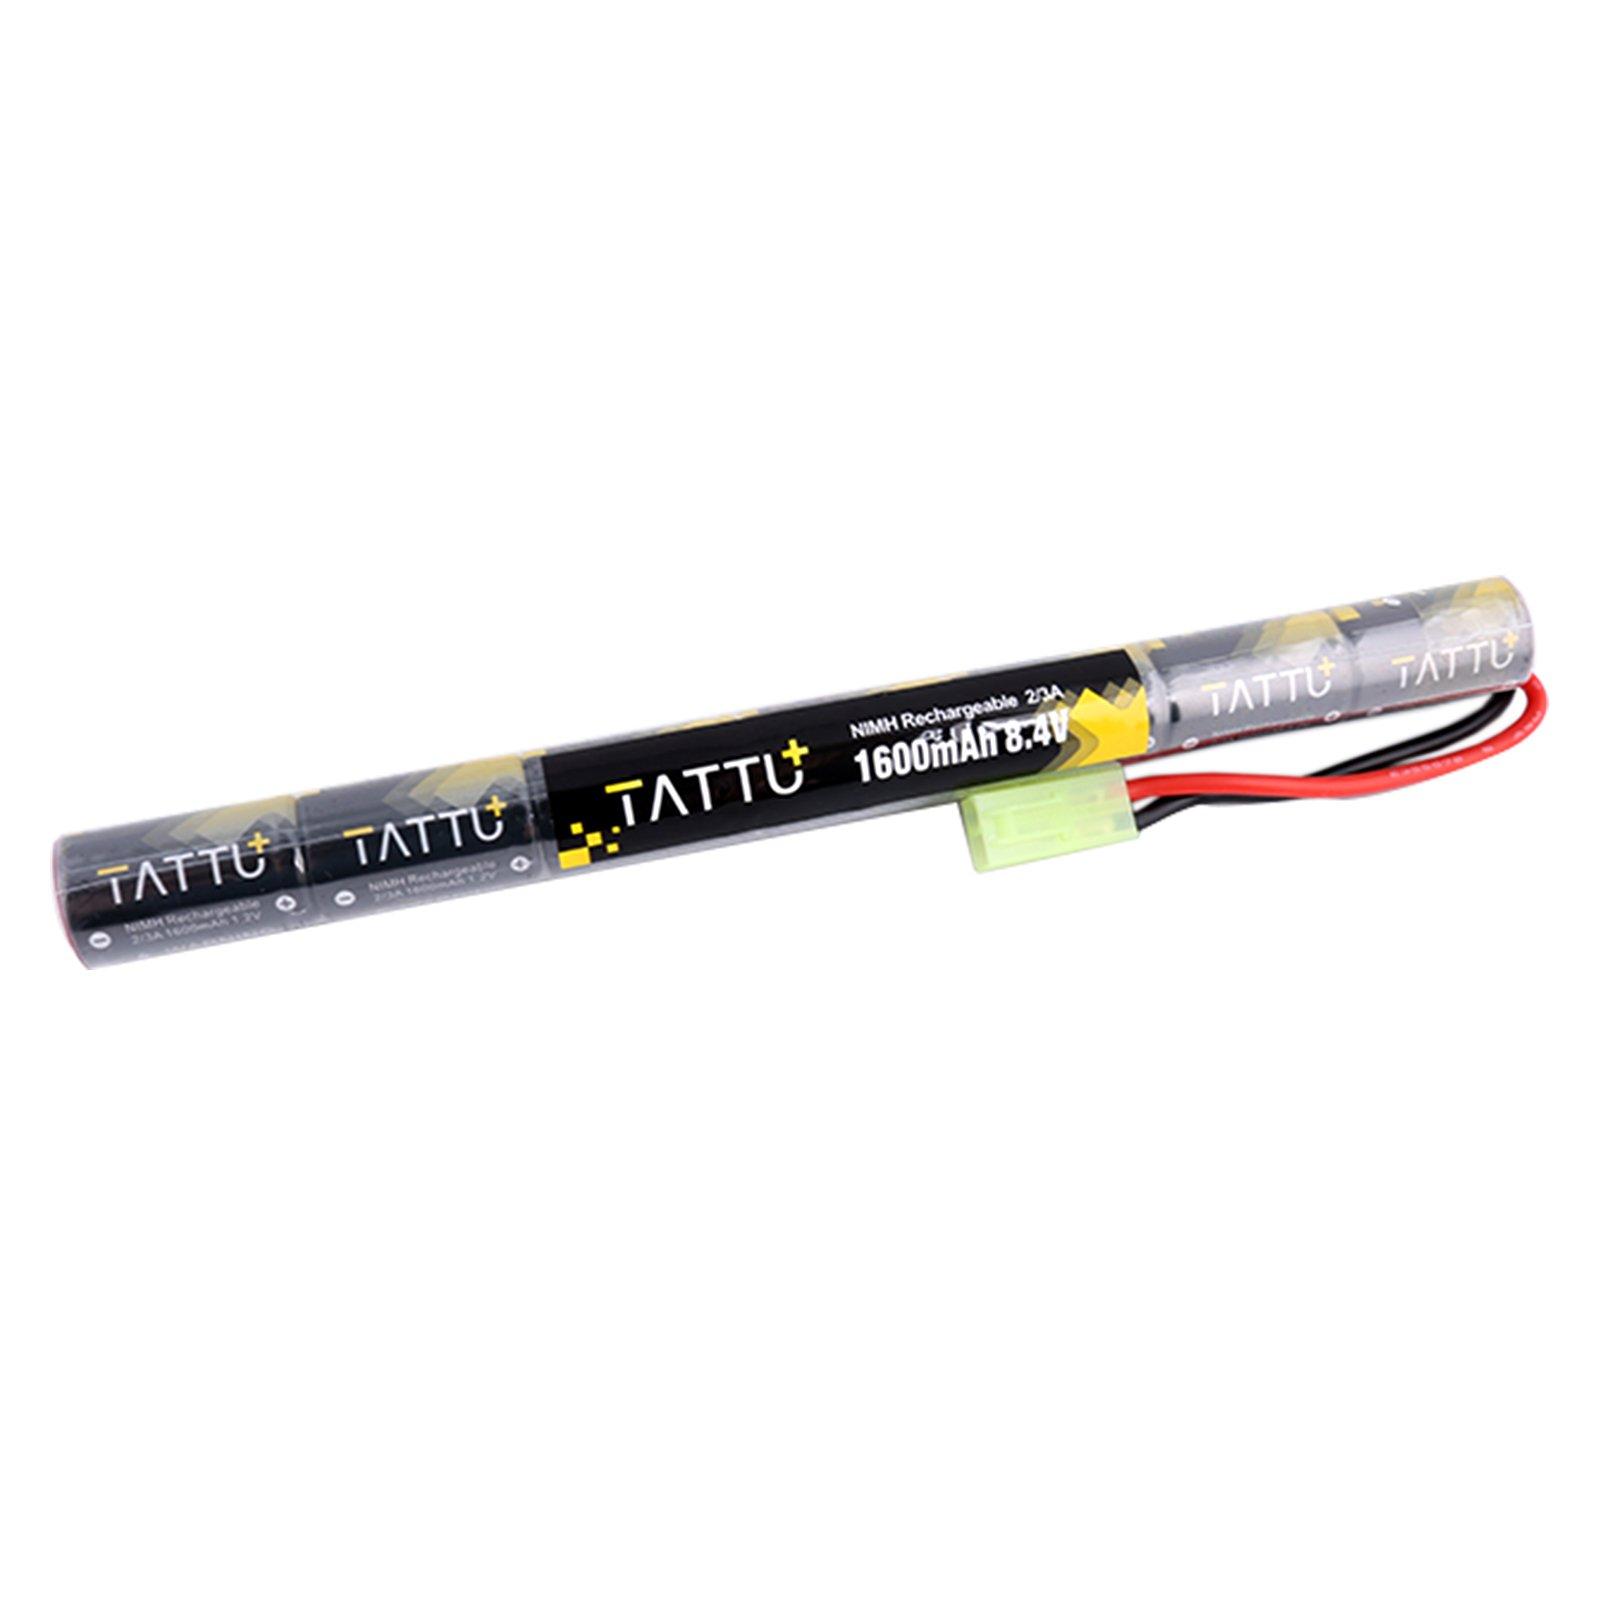 TATTU 8.4V NiMH Battery,1600mAh Butterfly Nunchuck Stick Battery with Tamiya Connector for Airsoft Gun